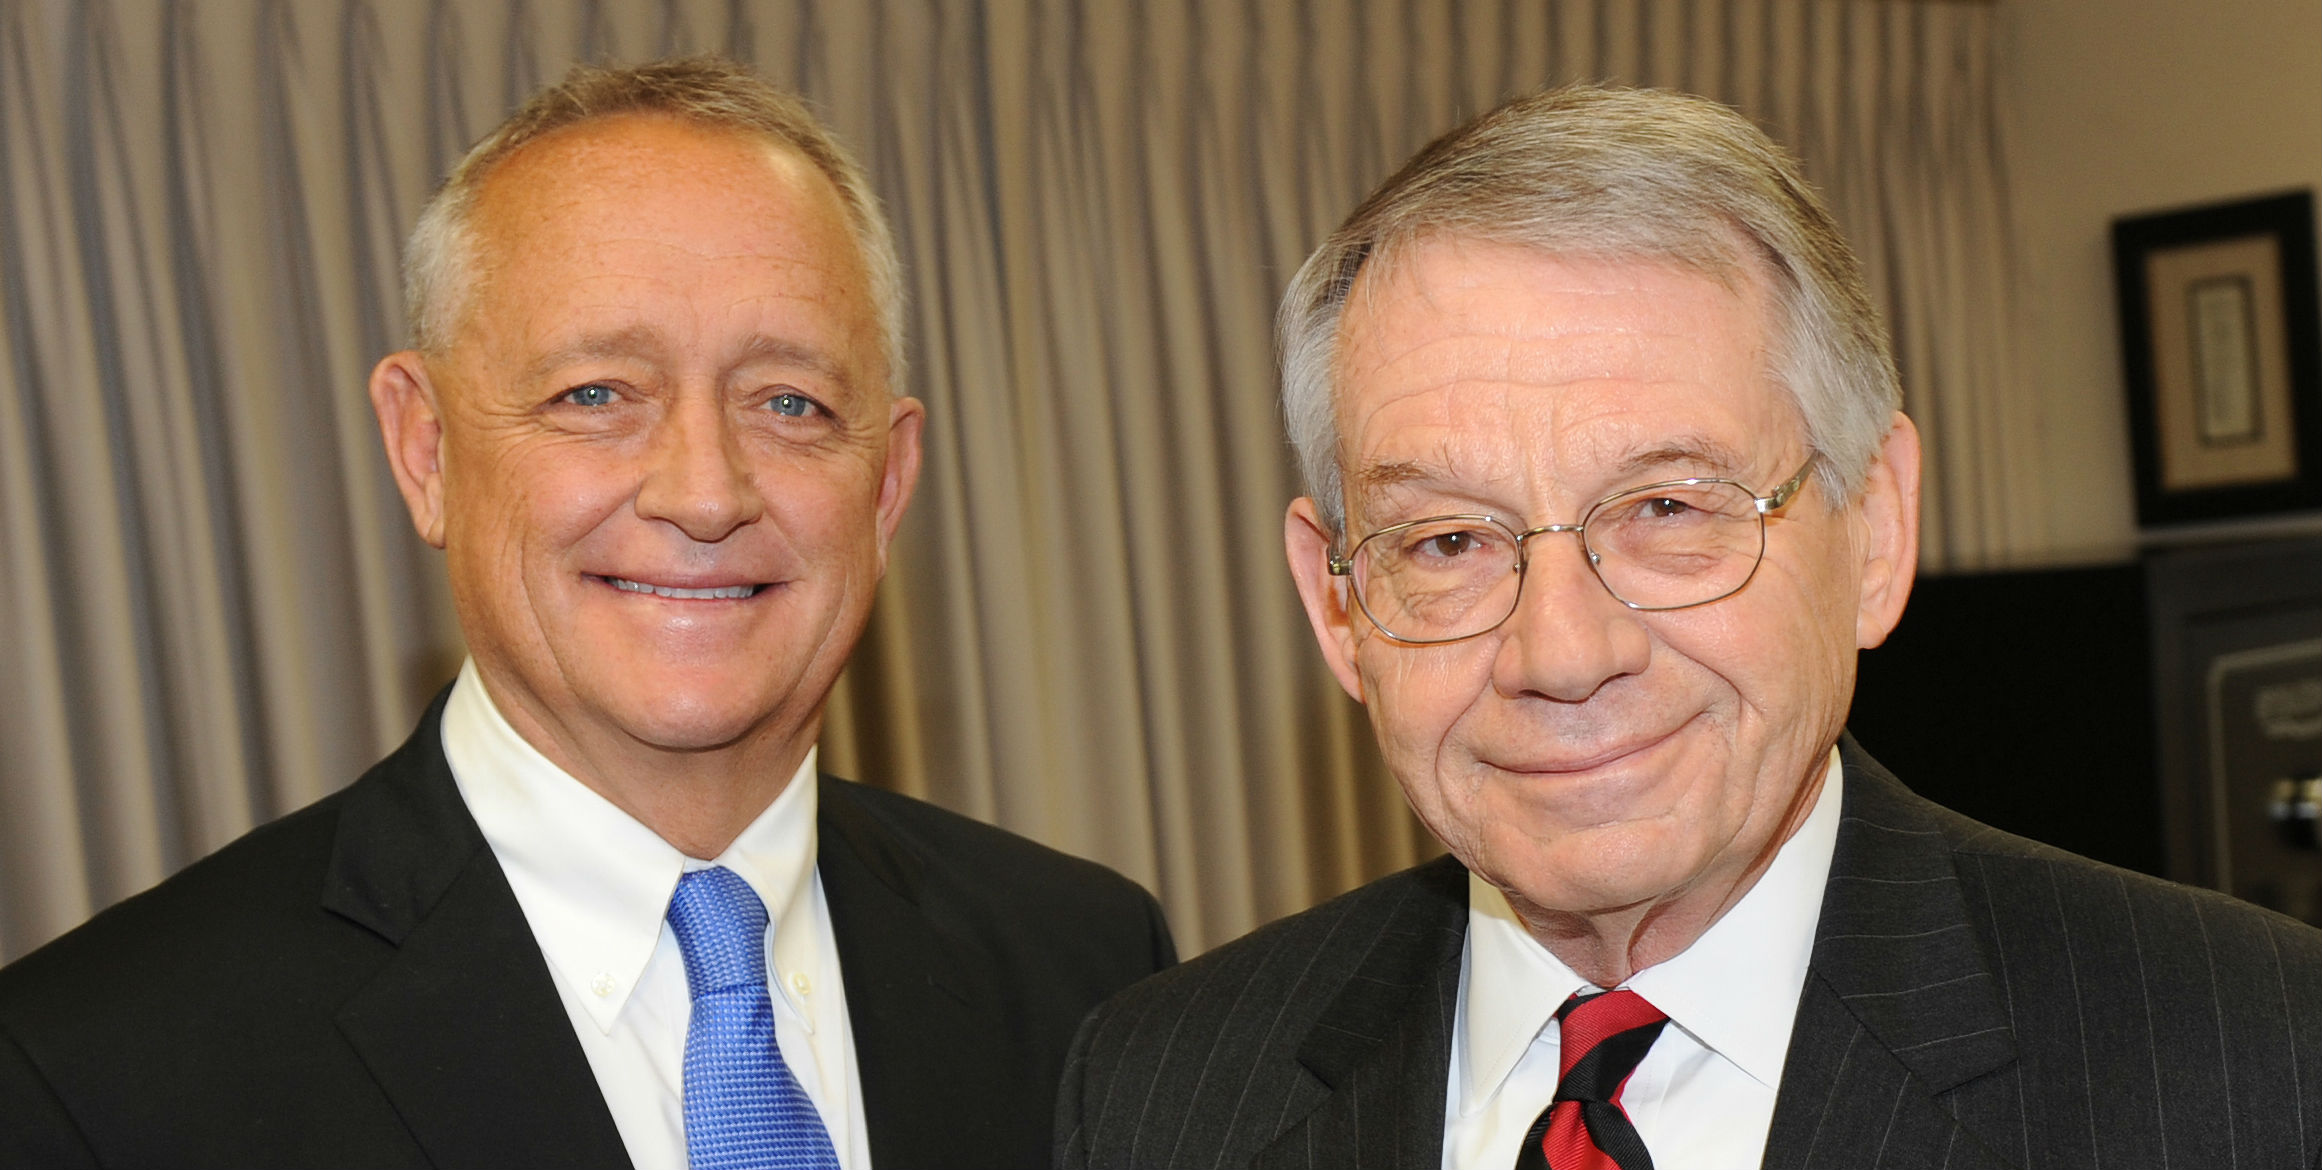 Hamilton County Prosecutor Joseph T Deters and James W. Harper